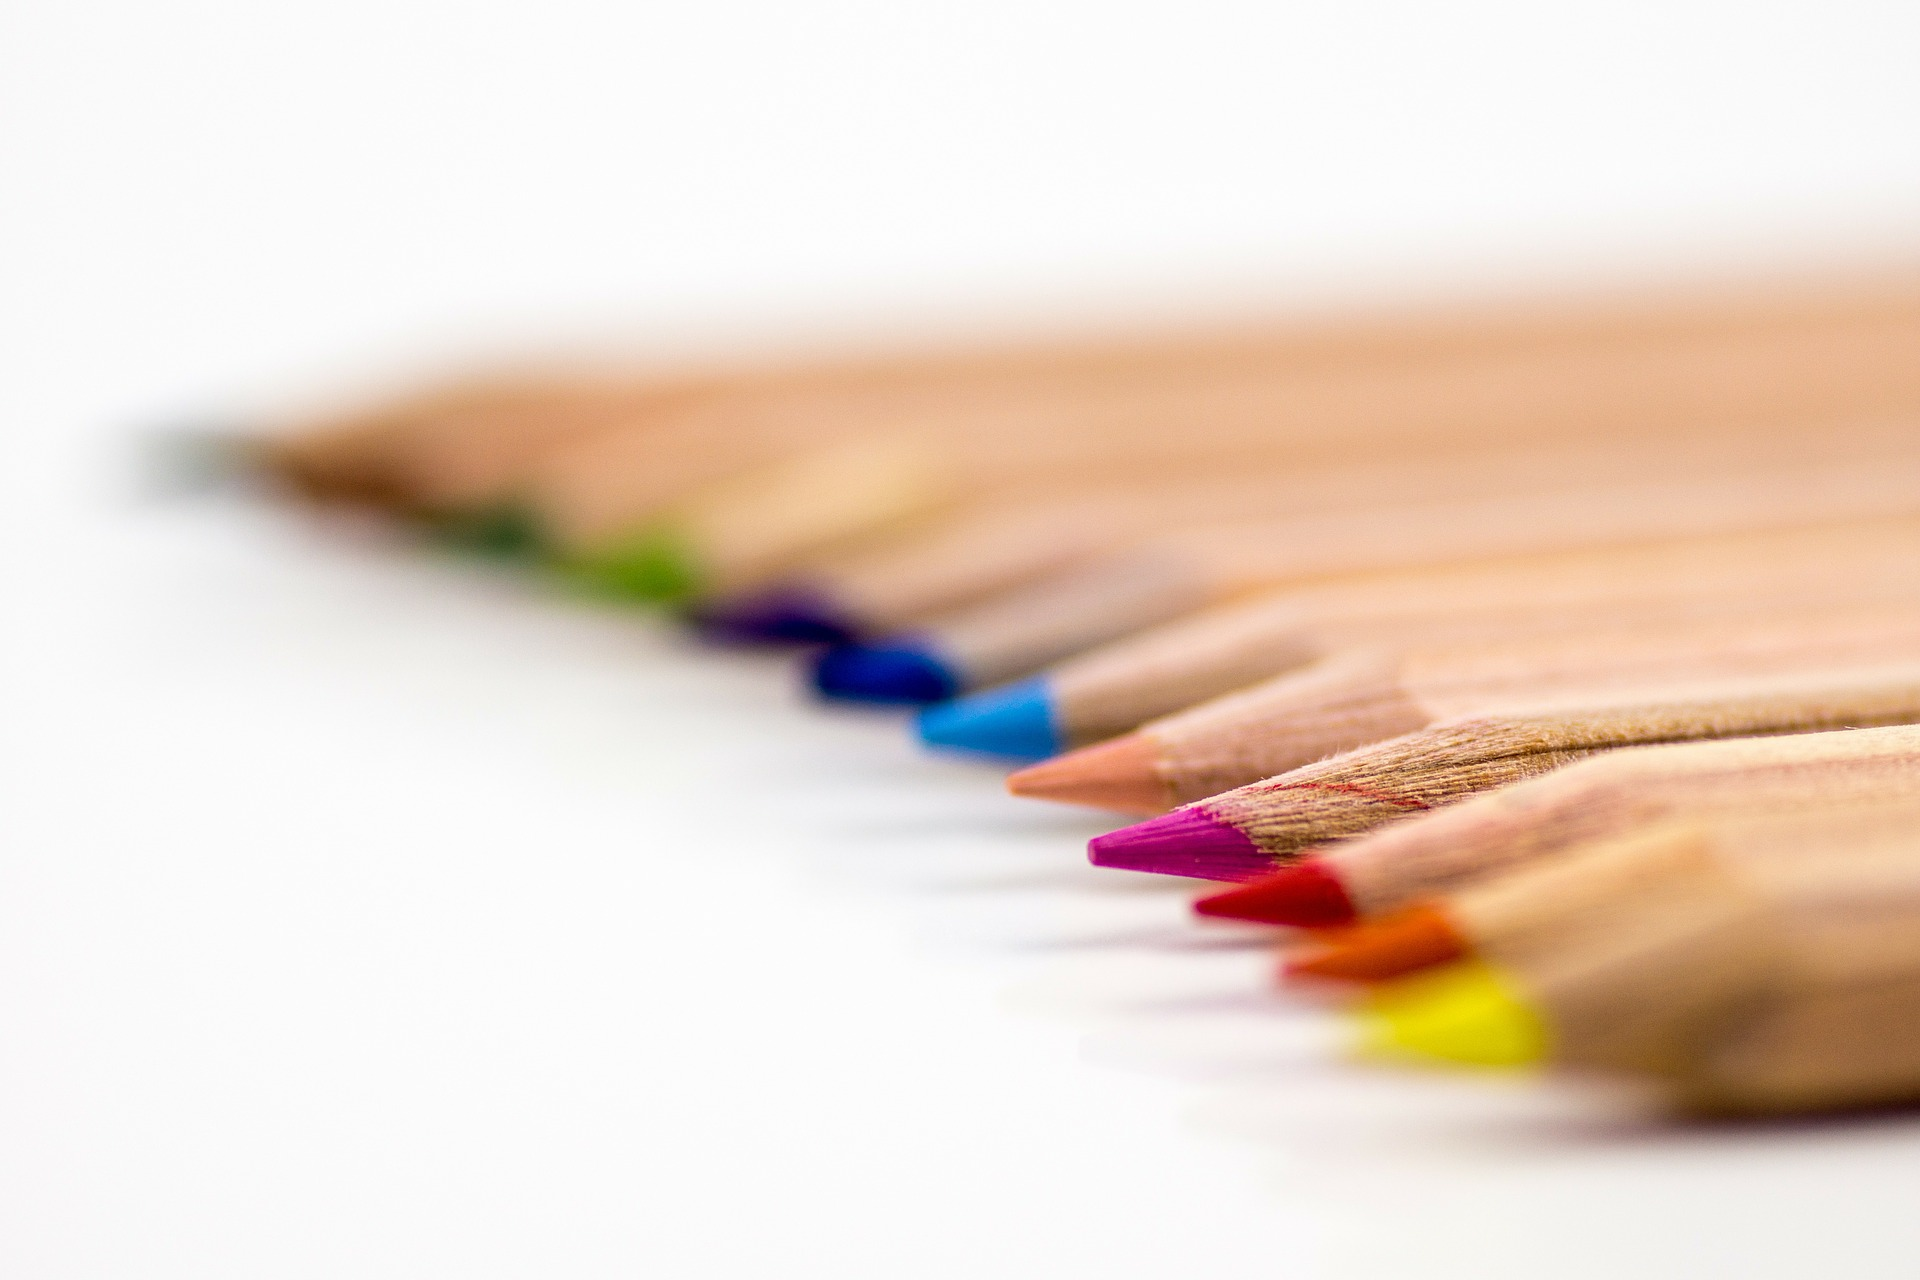 colored-pencils-168391_1920.jpg